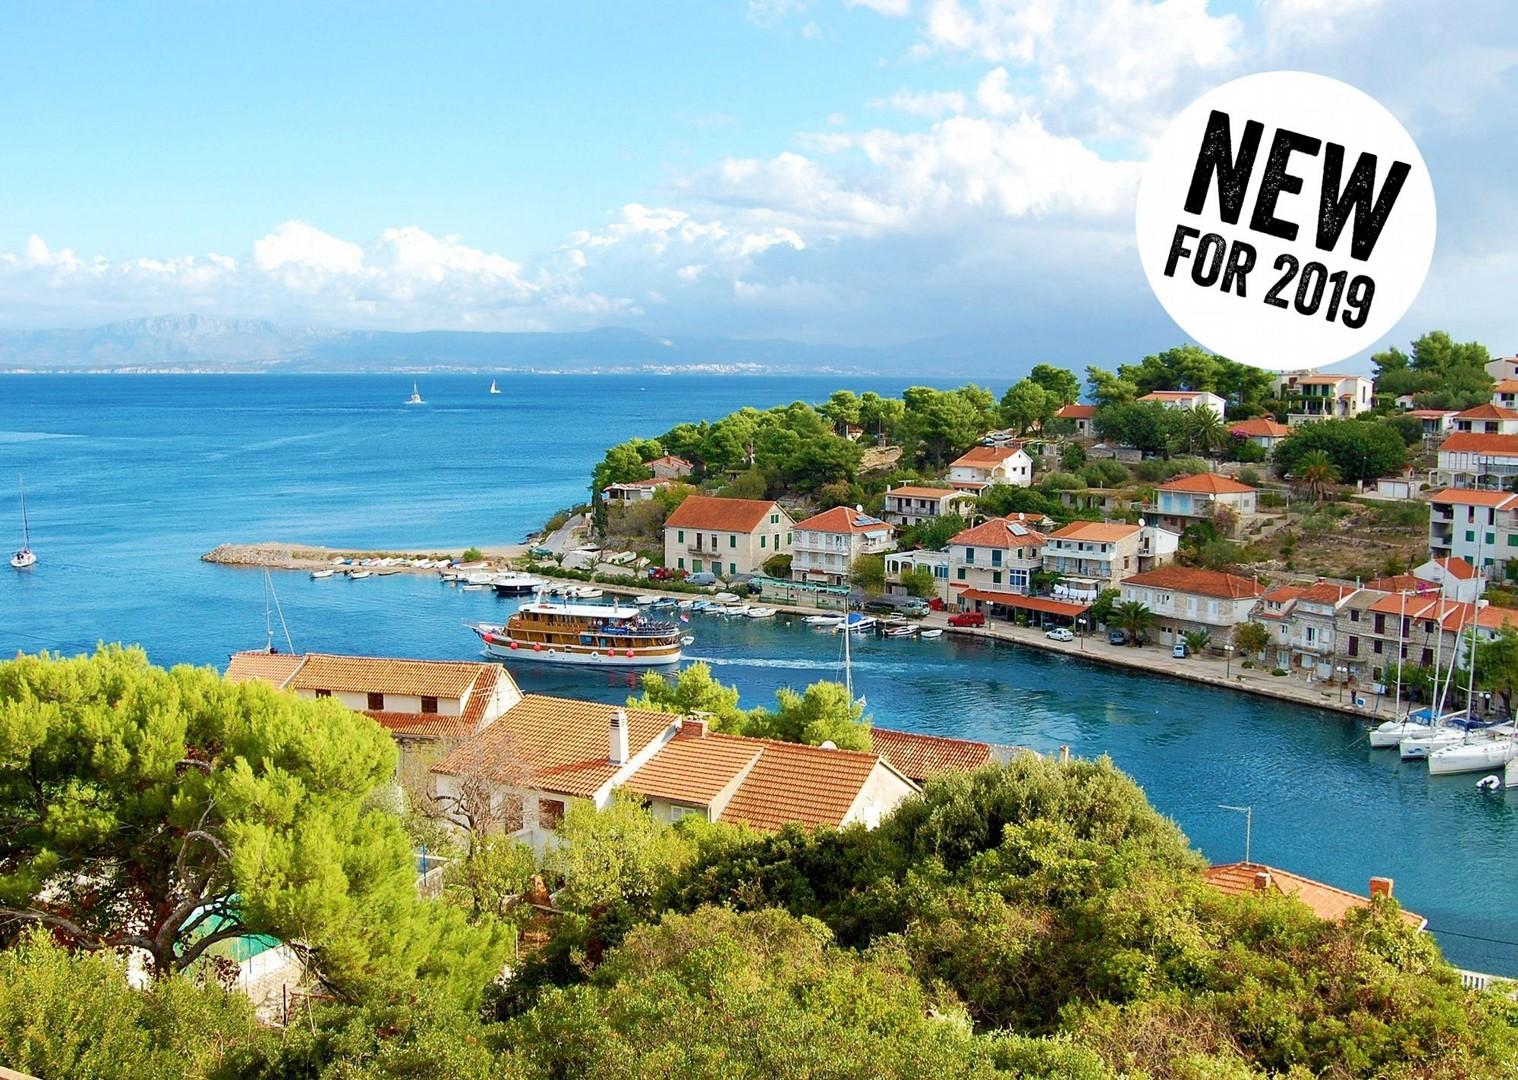 croatia-bike-and-boat-leisure-cycling-holiday.jpg - Croatia - Dalmatian National Parks and Islands Plus - Bike and Boat Holiday - Leisure Cycling